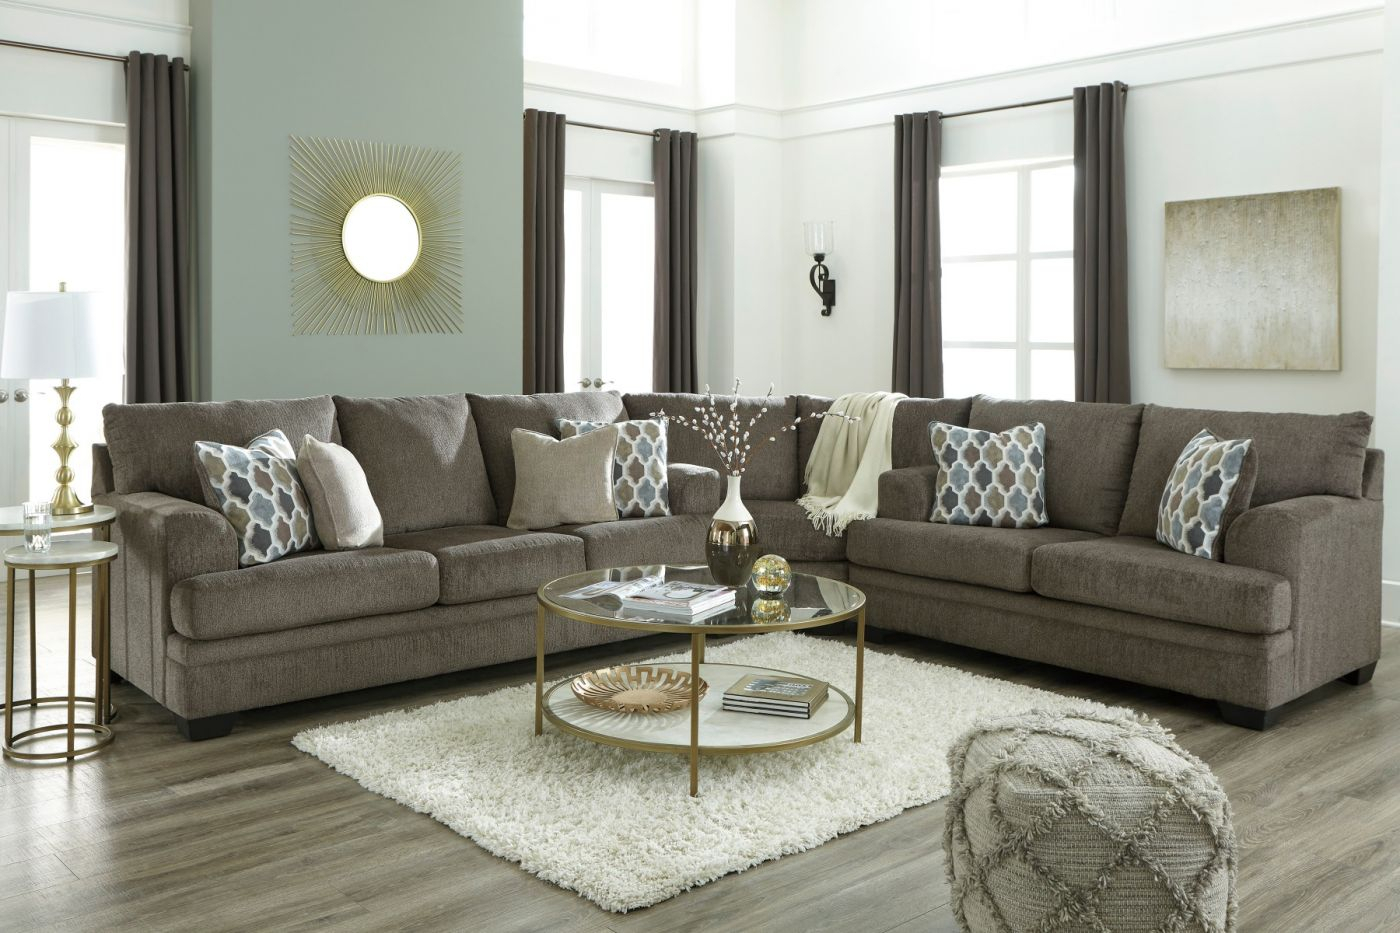 Dorsten Slate Sectional Signature Designashley Product Pertaining To Houston Sectional Sofas (View 14 of 15)